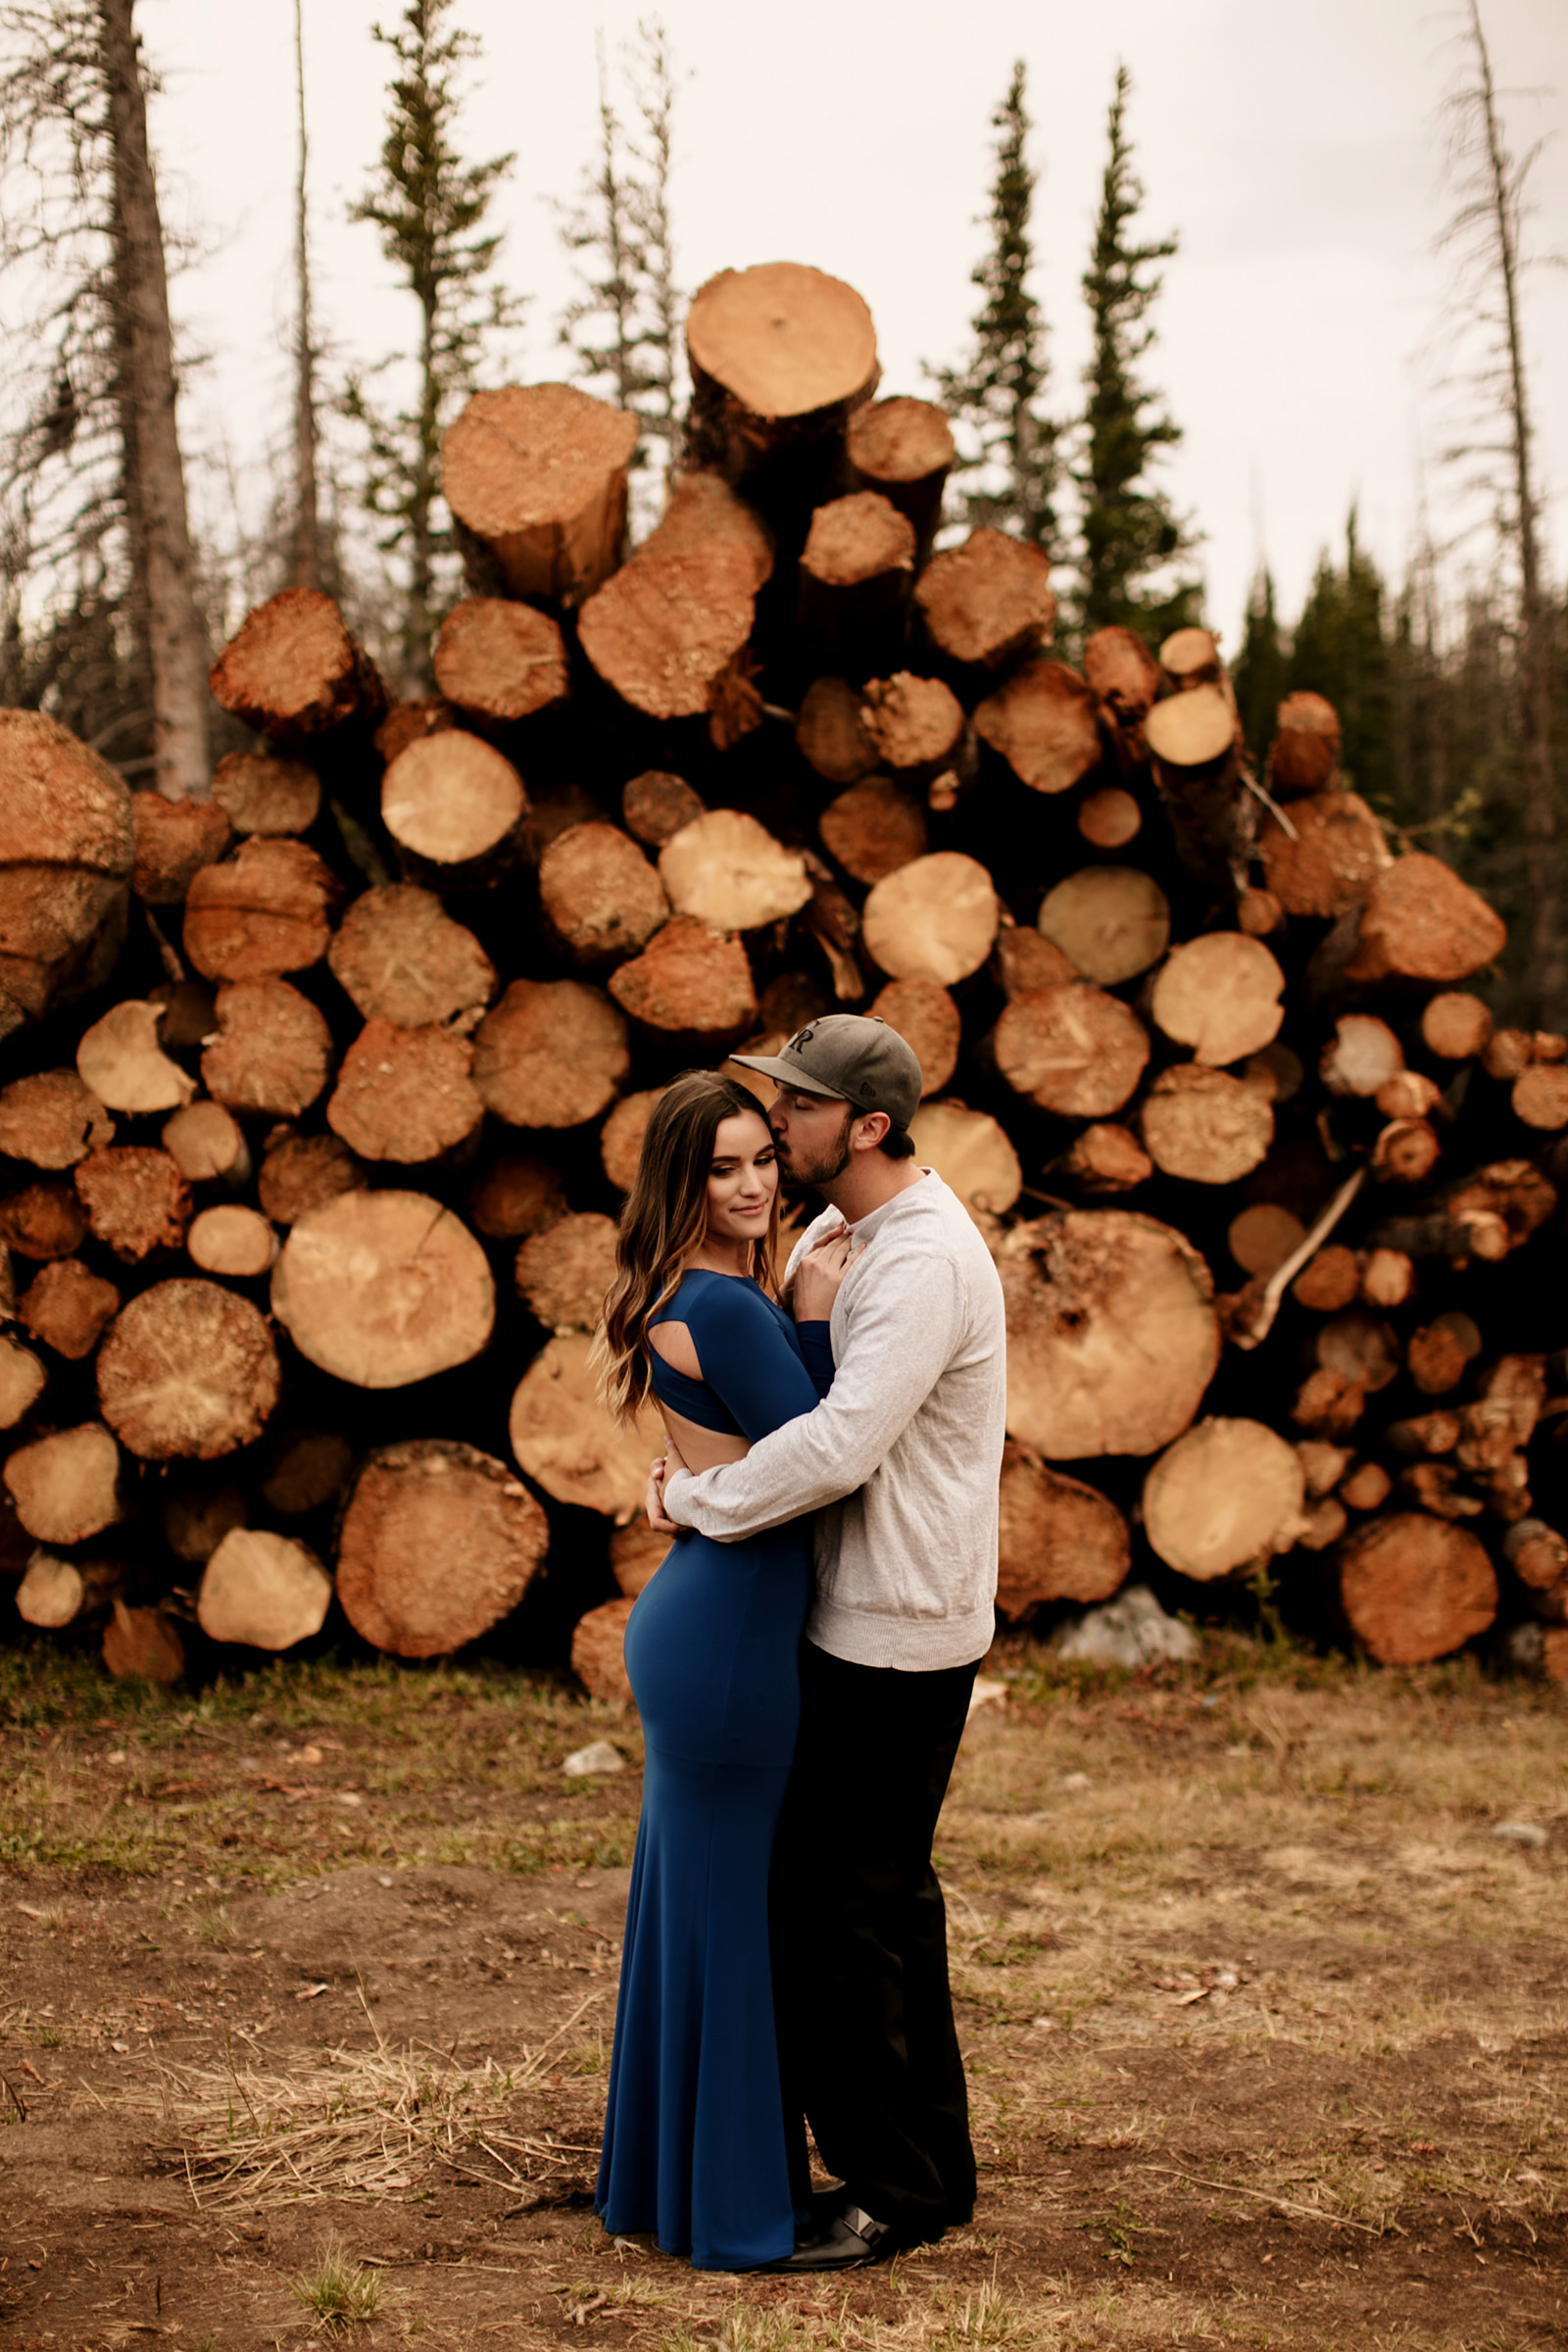 Liz Osban Photography Cheyenne Wyoming Engagement Wedding Photographer couple adventure elopement wedding laramie denver fort collins colorado rocky mountain national park37.jpg